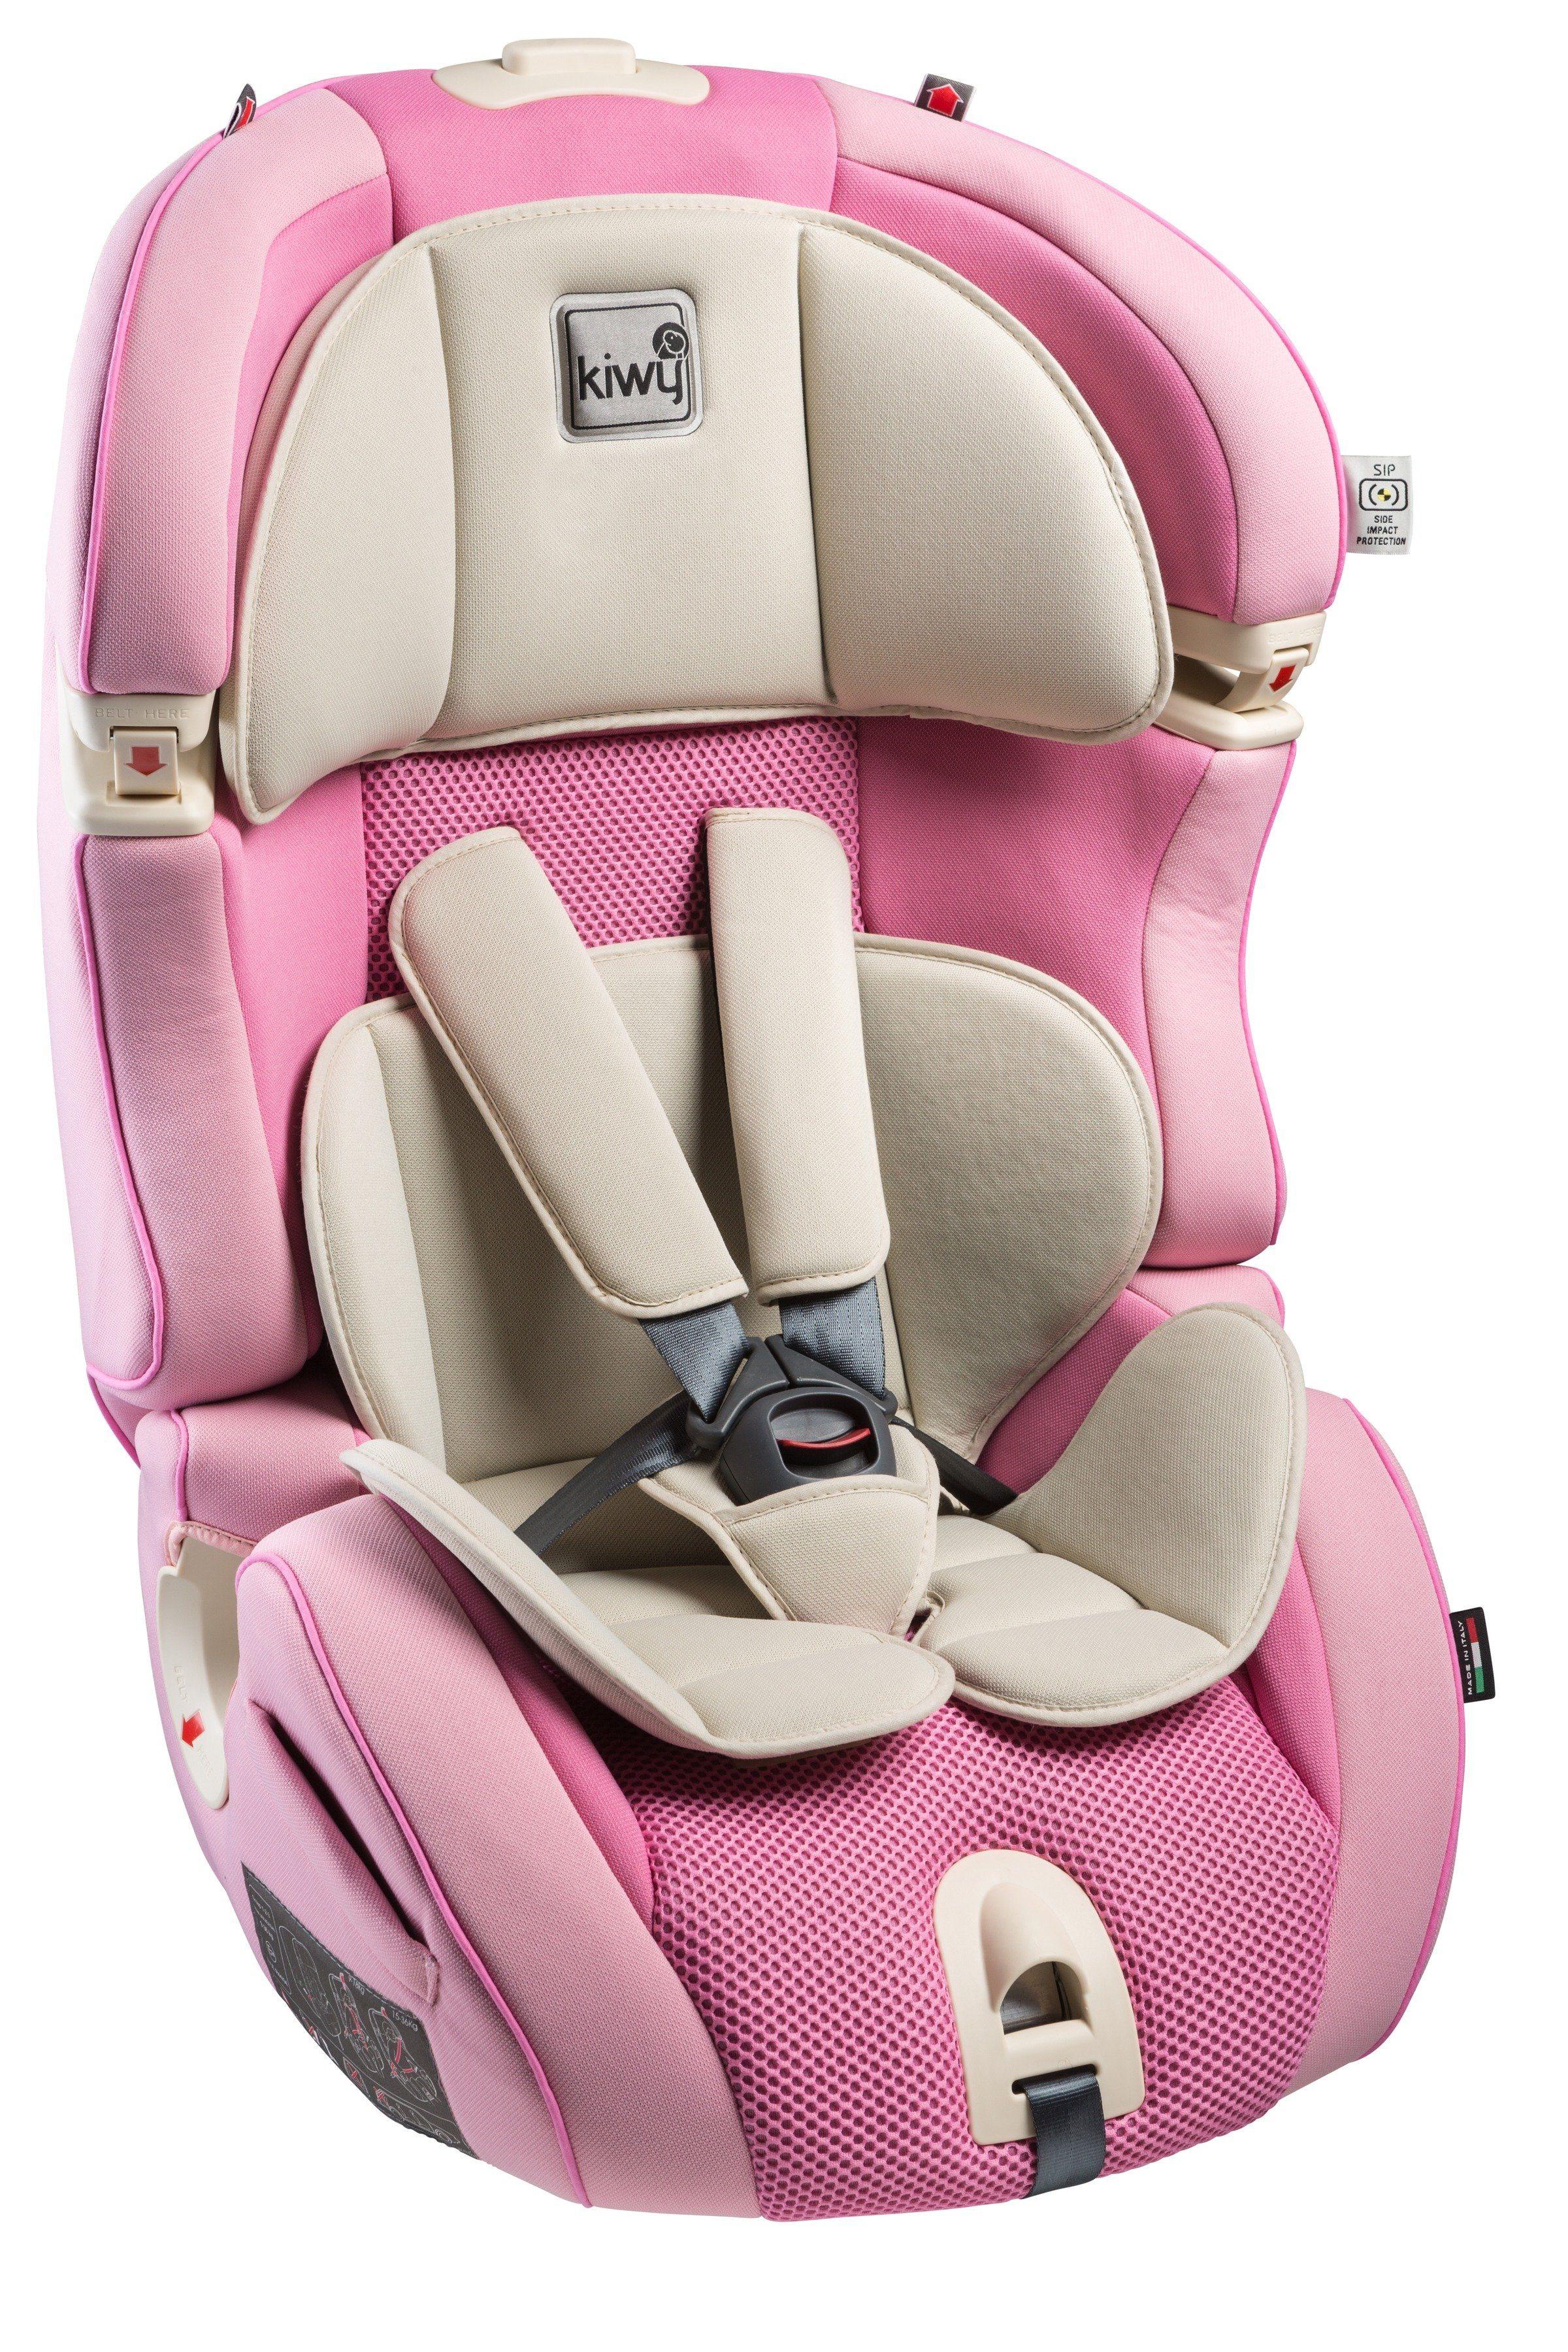 KIWY Kindersitz »SL123 Universal«, 10 - 36 kg